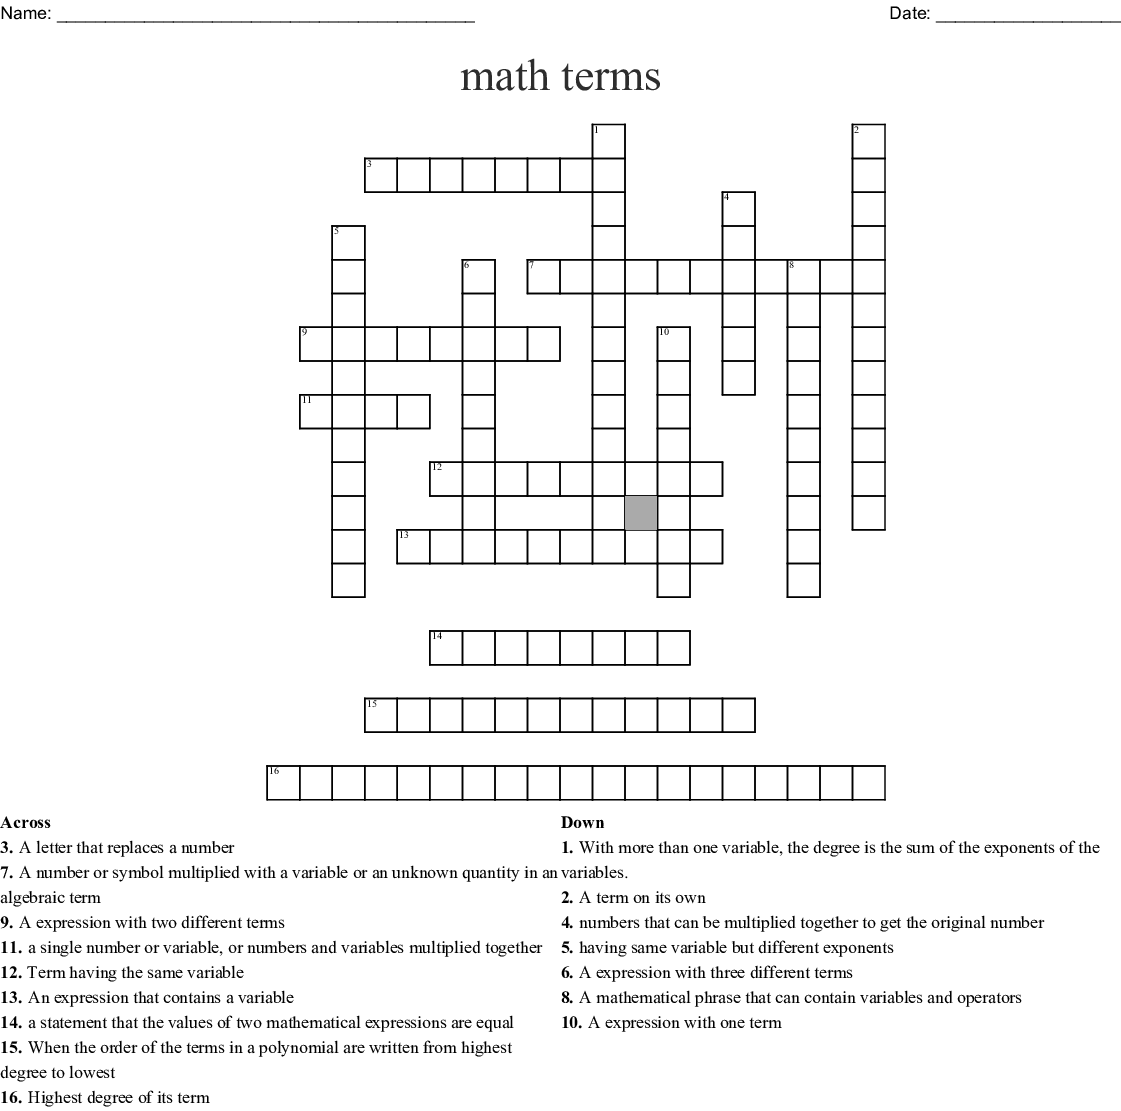 Algebra Vocabulary Crossword - WordMint